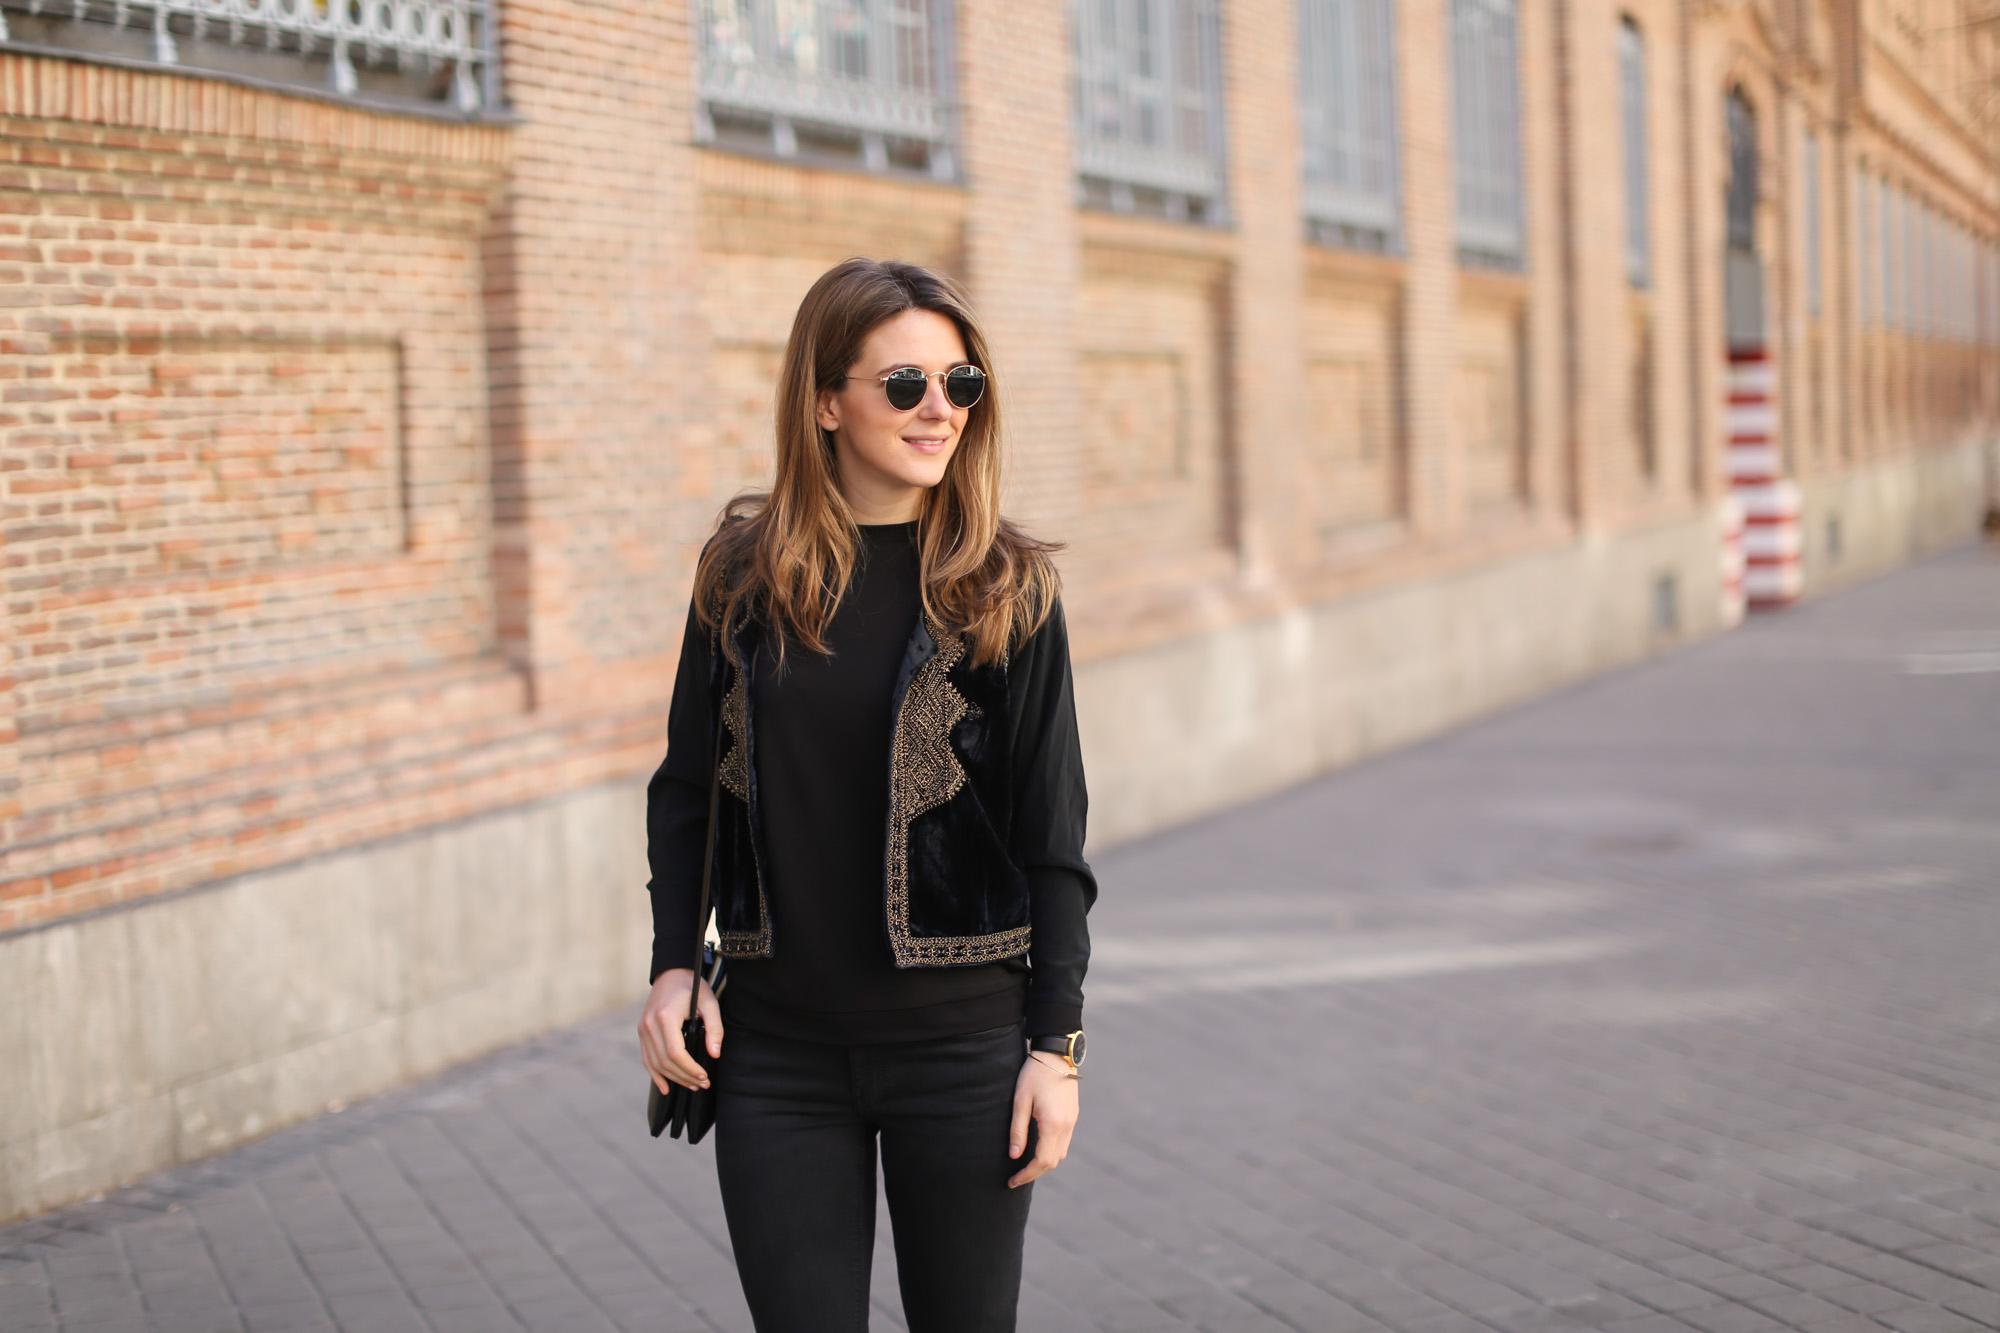 Clochet-streetstyle-zara-black-flared-jeans-boho-vest-larssonandjennins-saxon-5